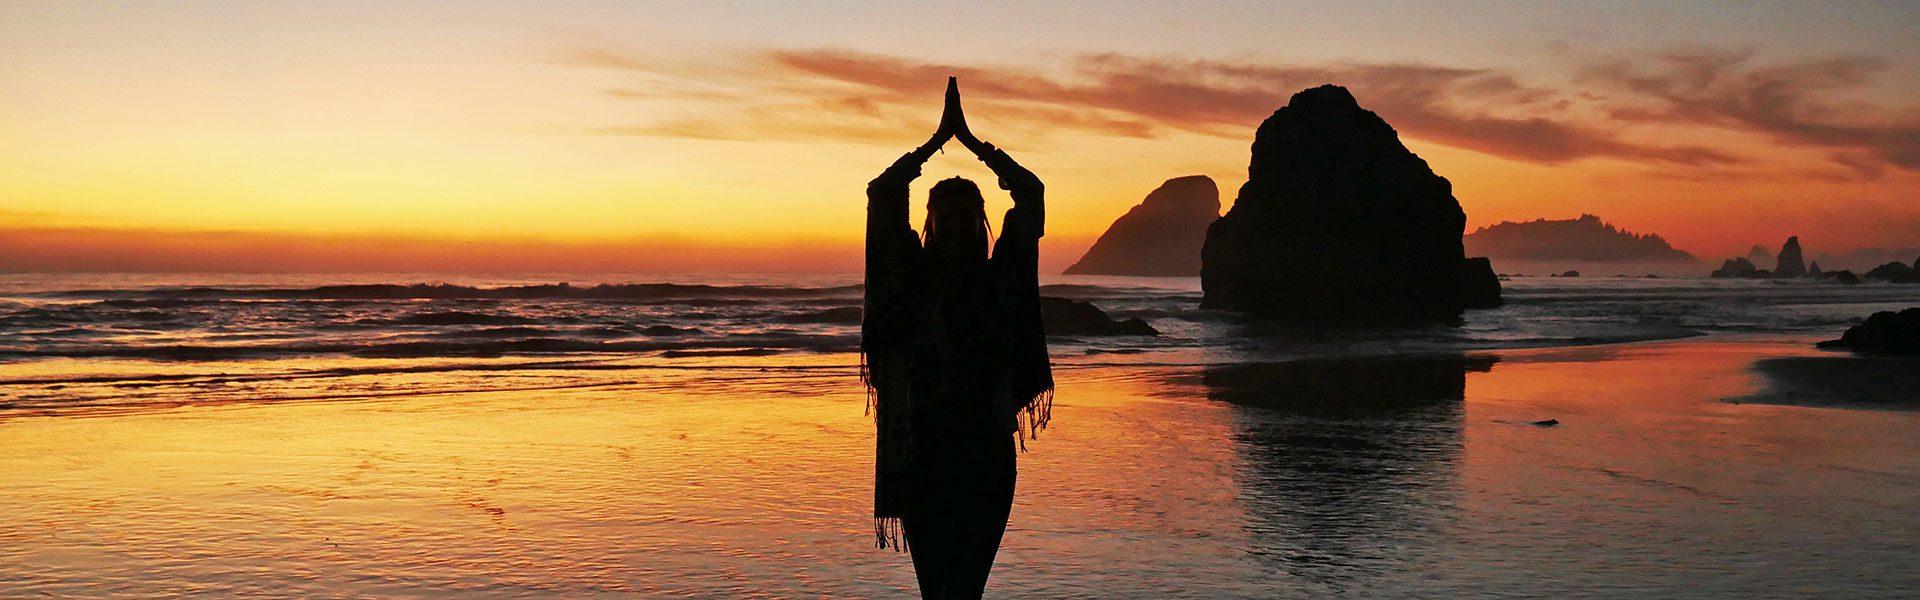 Rasta girl during sunset at Moonstone Beach in Northern California